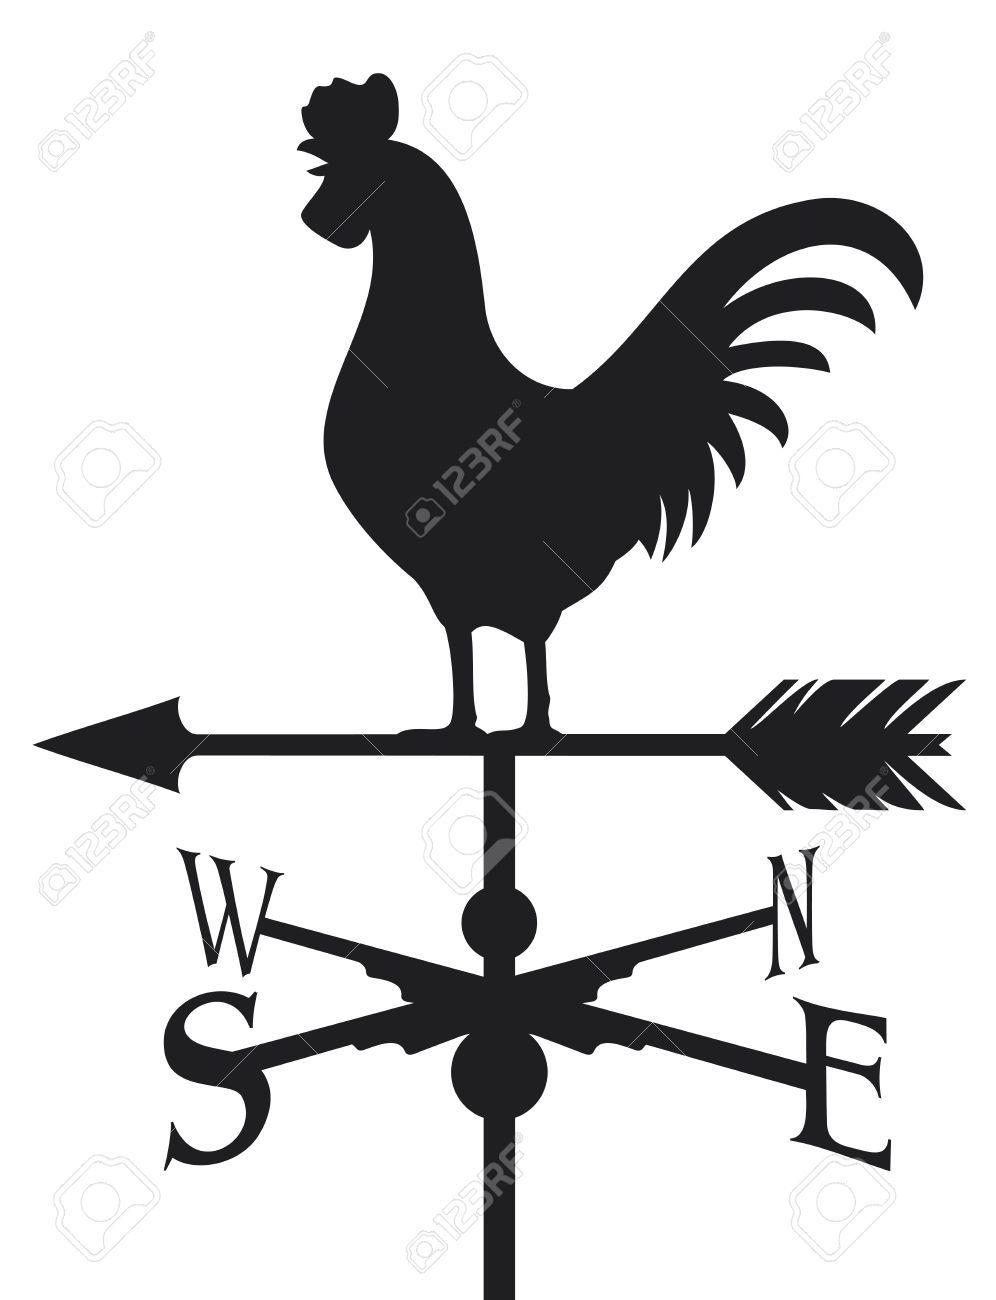 Rooster Weather Vane Weathercock Silhouette Rooster Weather Vane Illustration Aff Vane Weather Rooster Illustration Silhouette Clip Art Weather Vanes